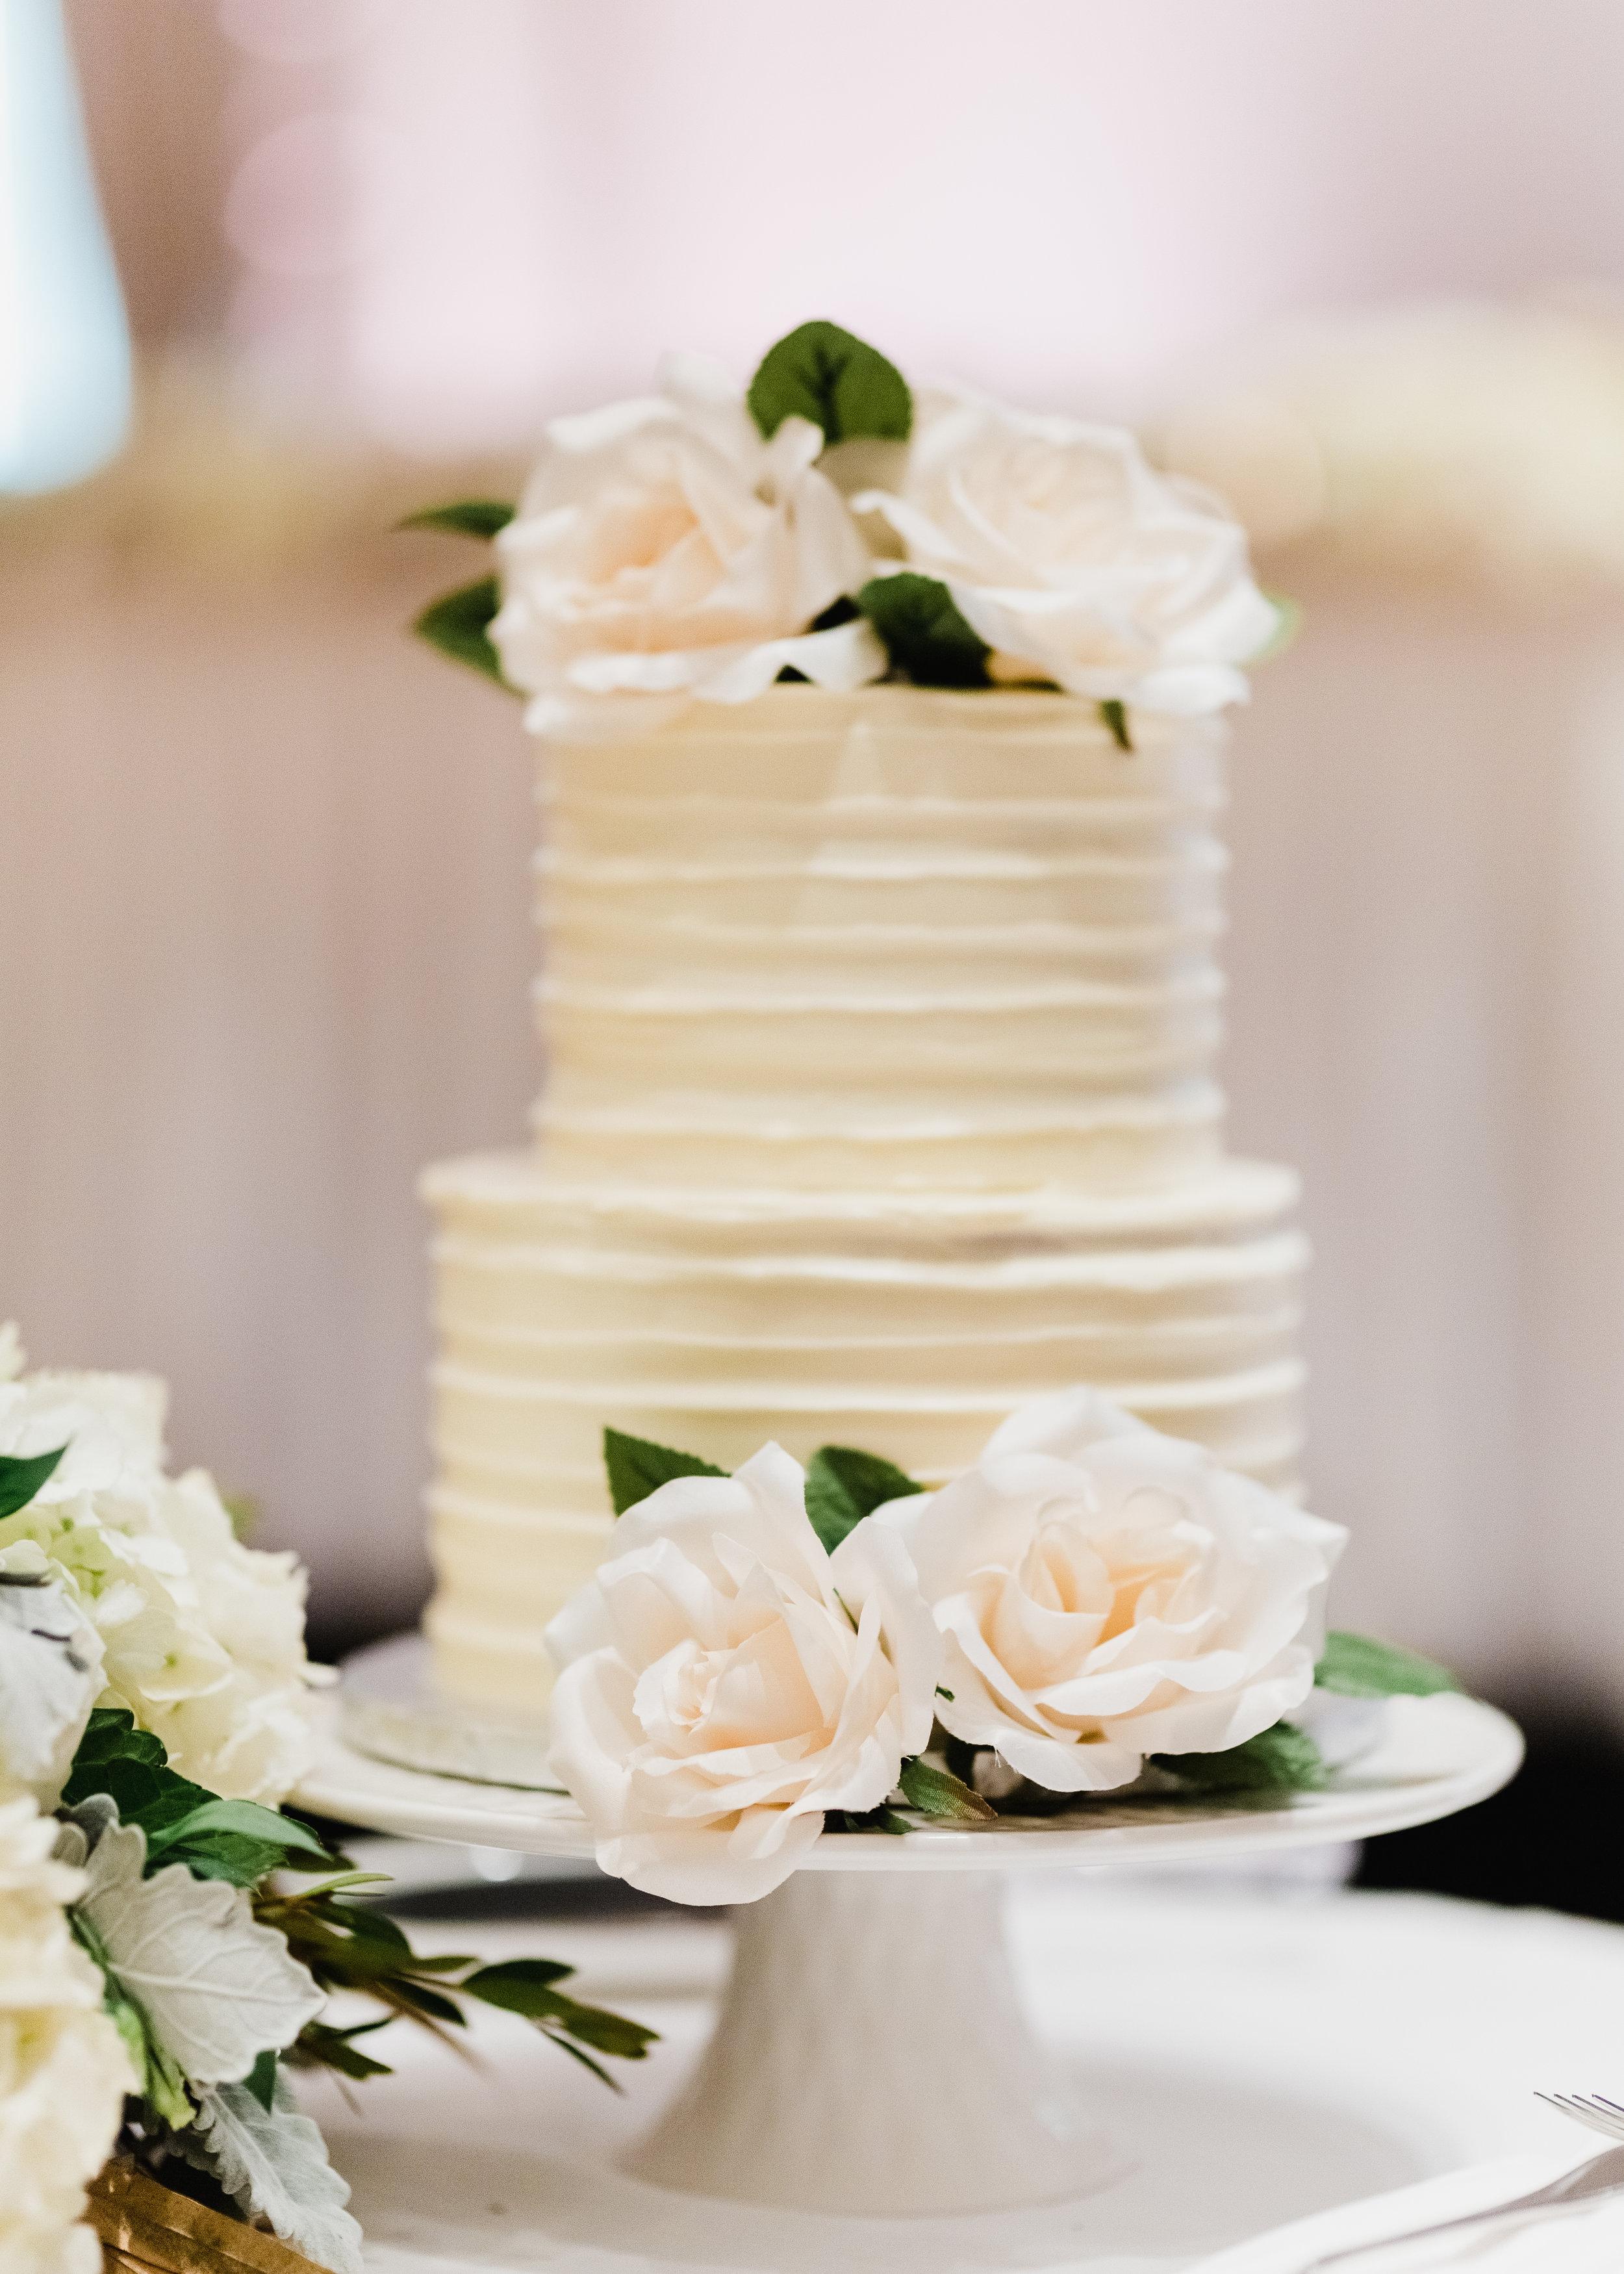 HeraStudios_Selects_Full_KatrinaAndrew_Wedding_Version2-337.jpg